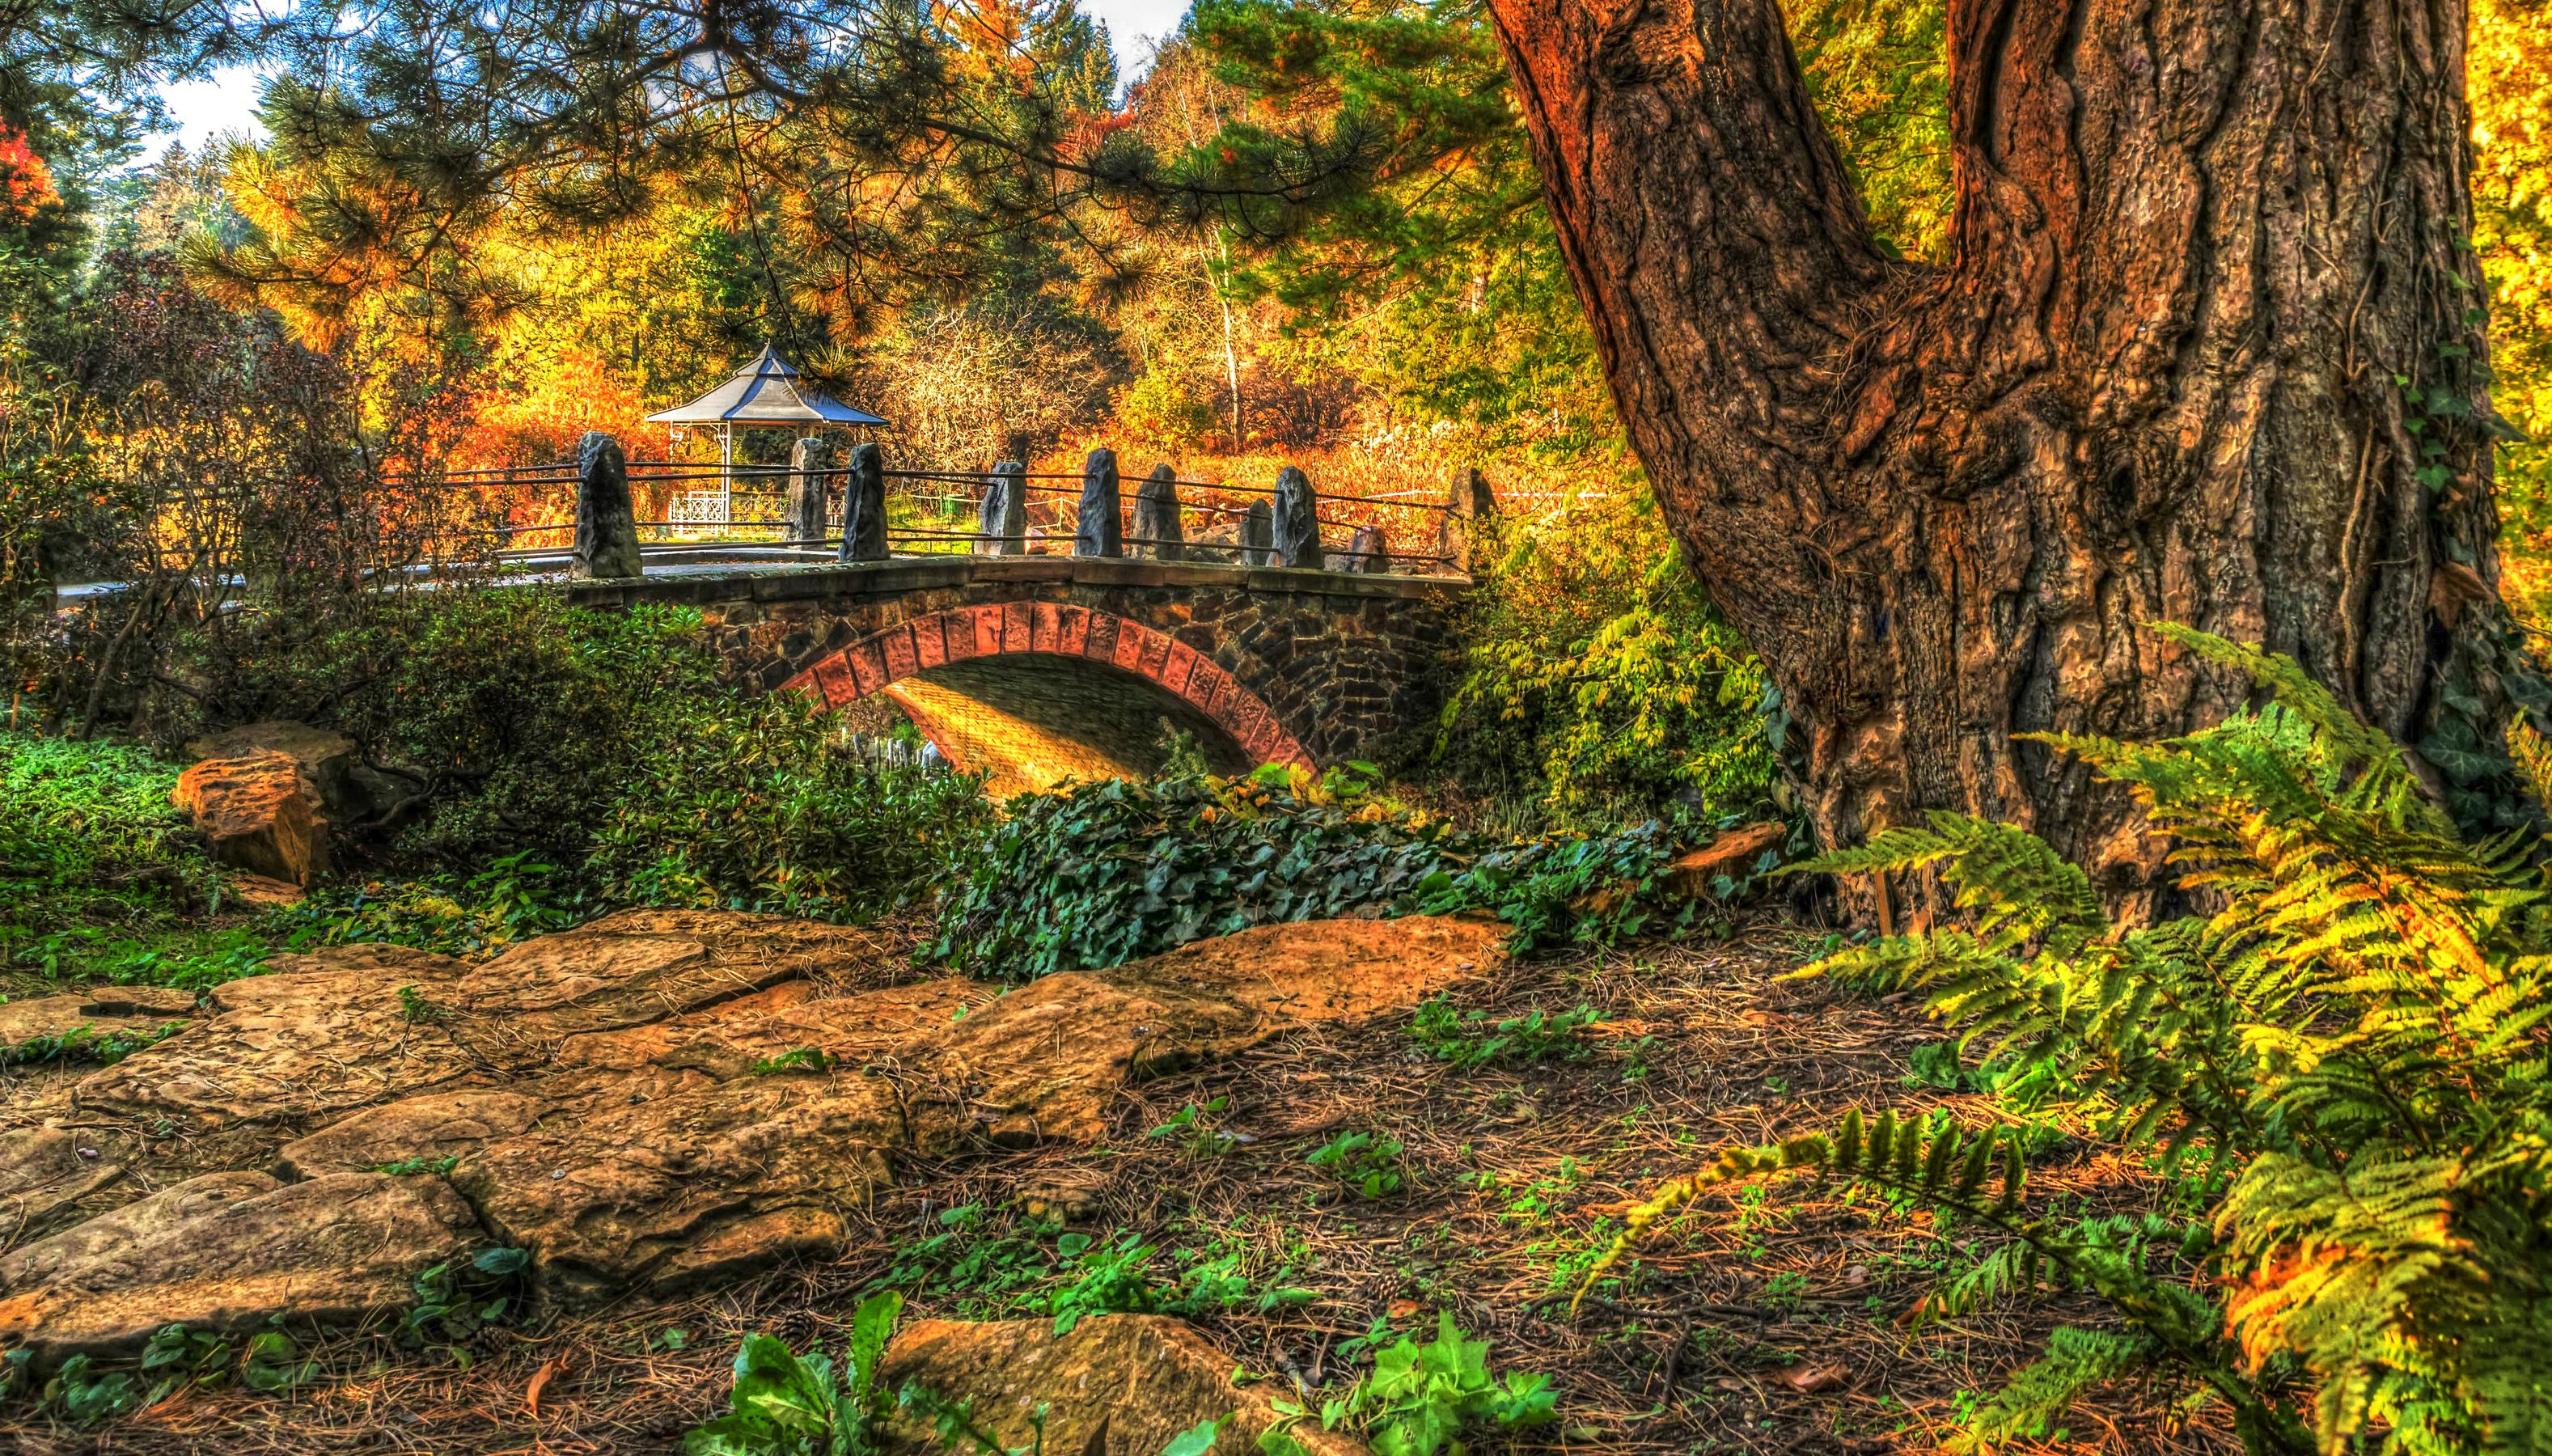 Bridge In Autumn Park Hd Wallpaper Background Image